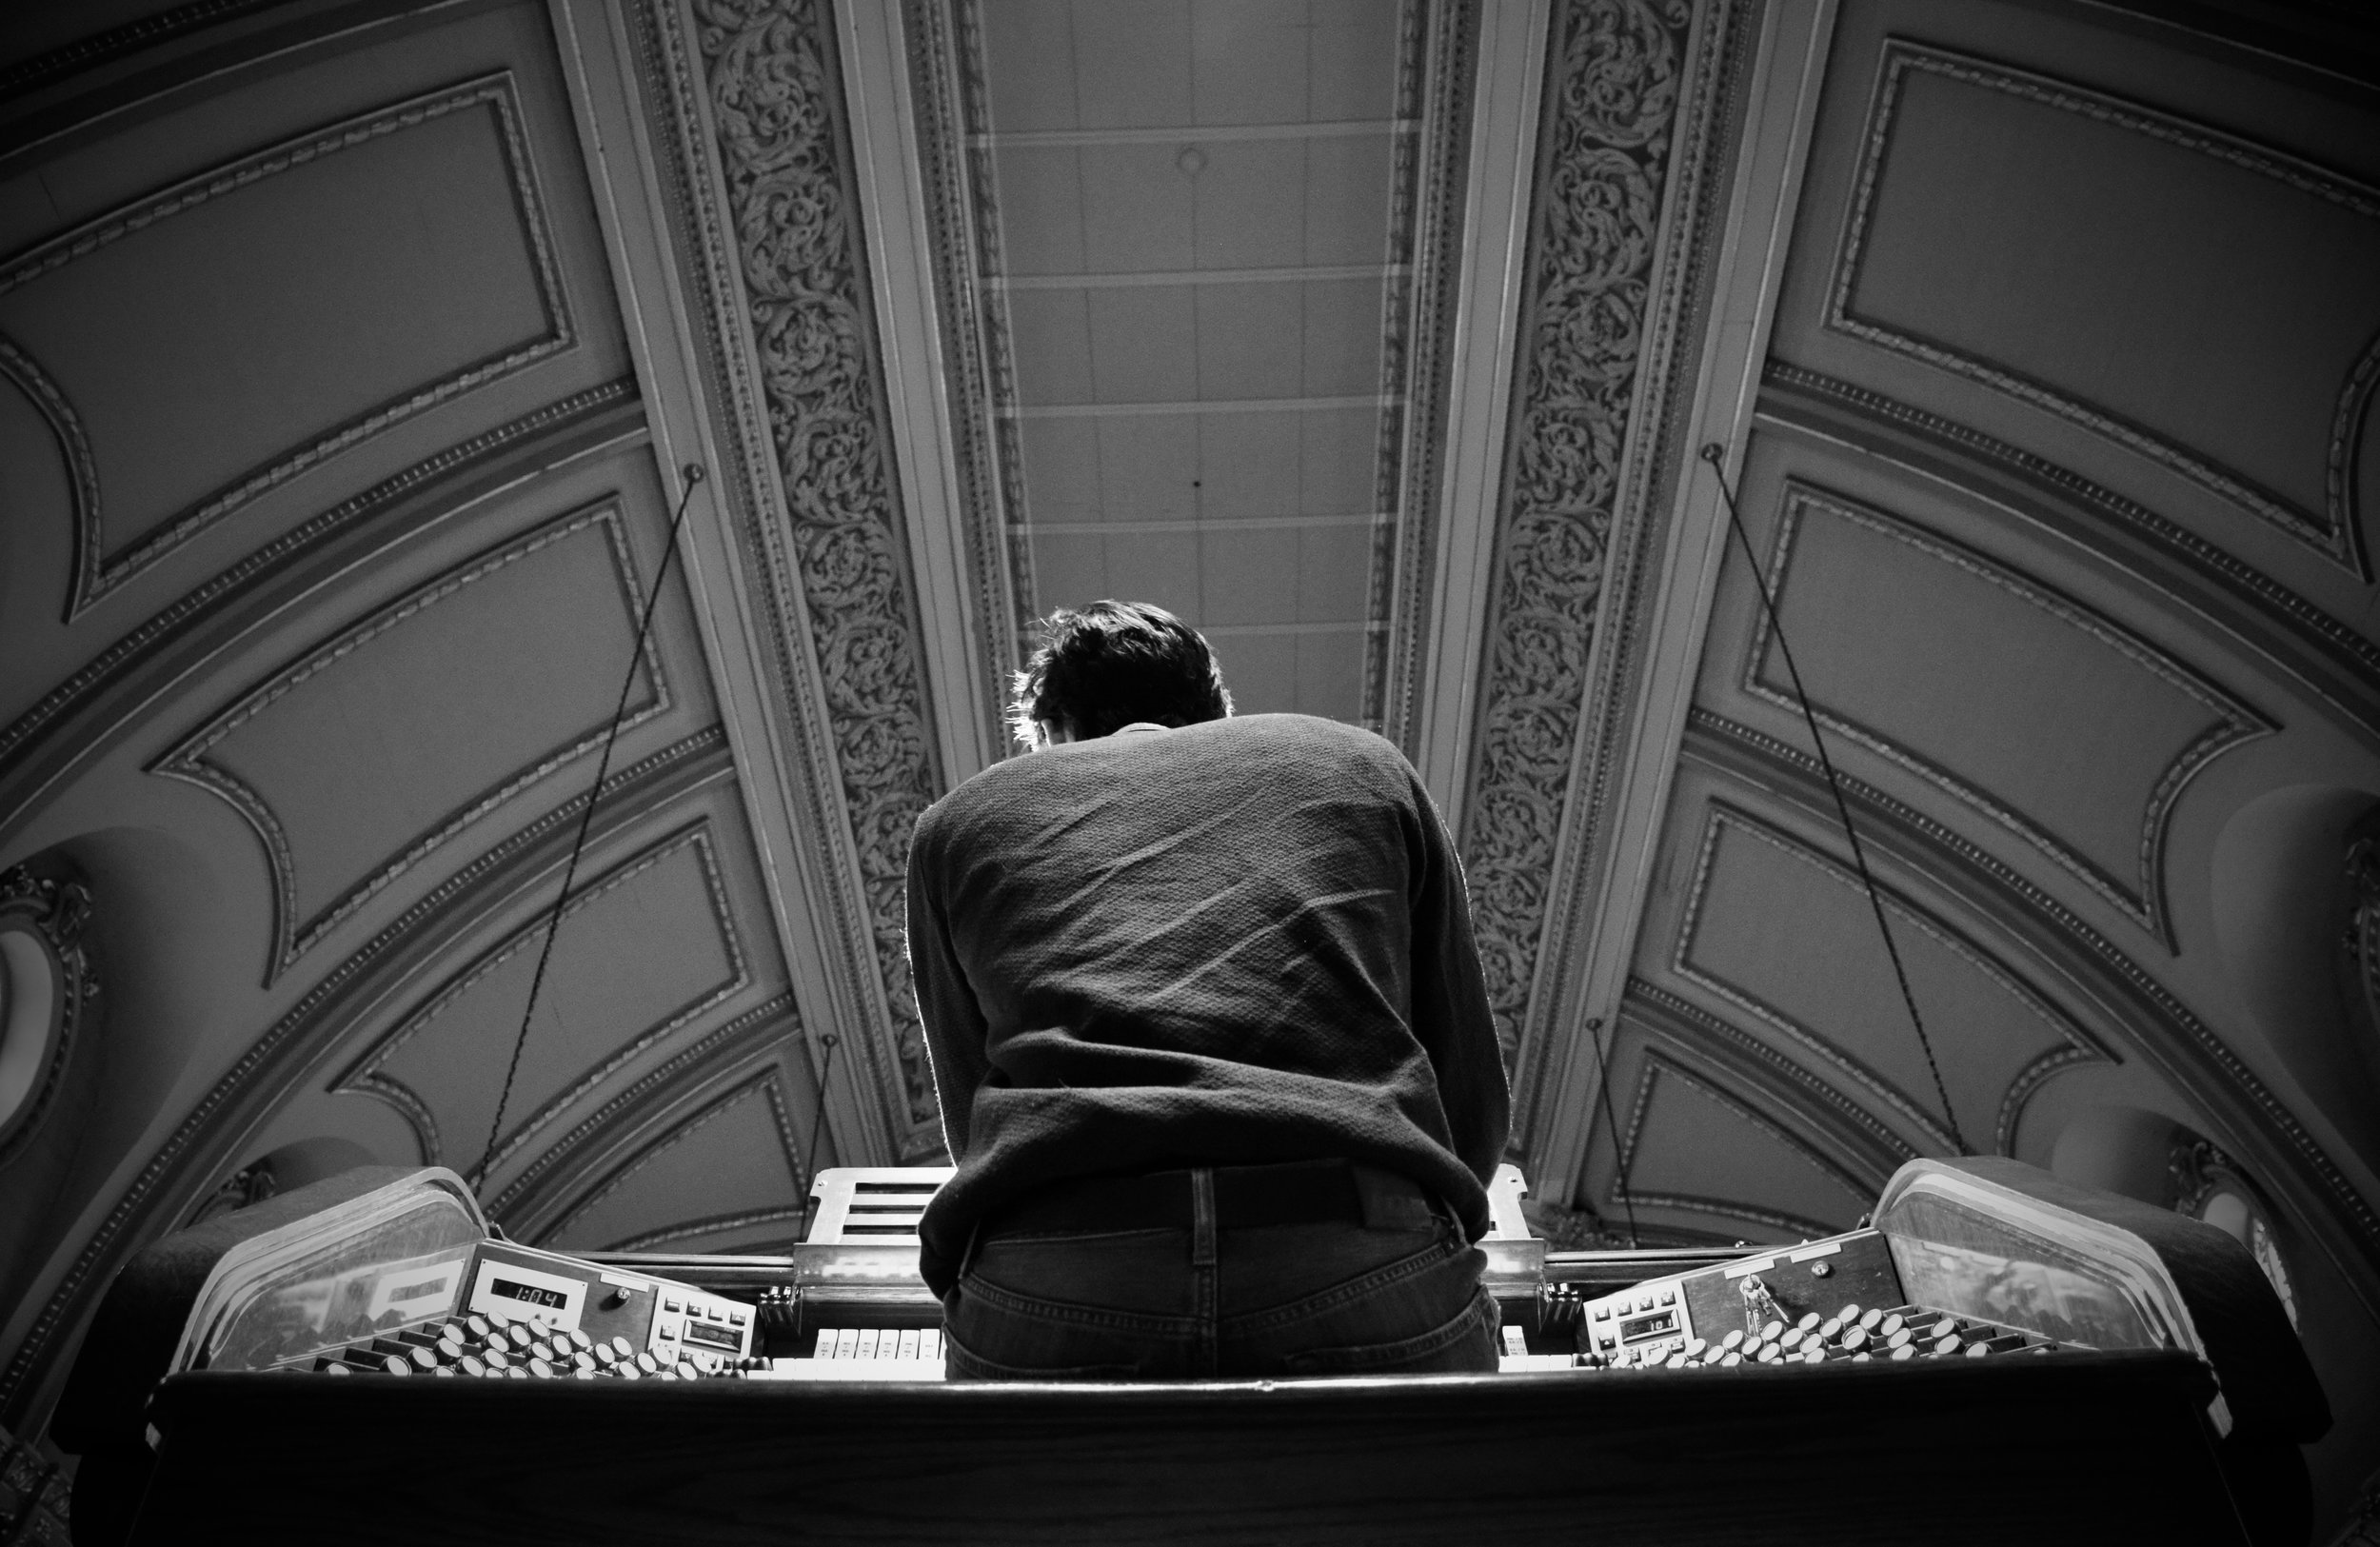 Elliot Parlin plays Casavant organ, Eglise St-Jean Baptiste, Montreal. Boston Organ Studio.